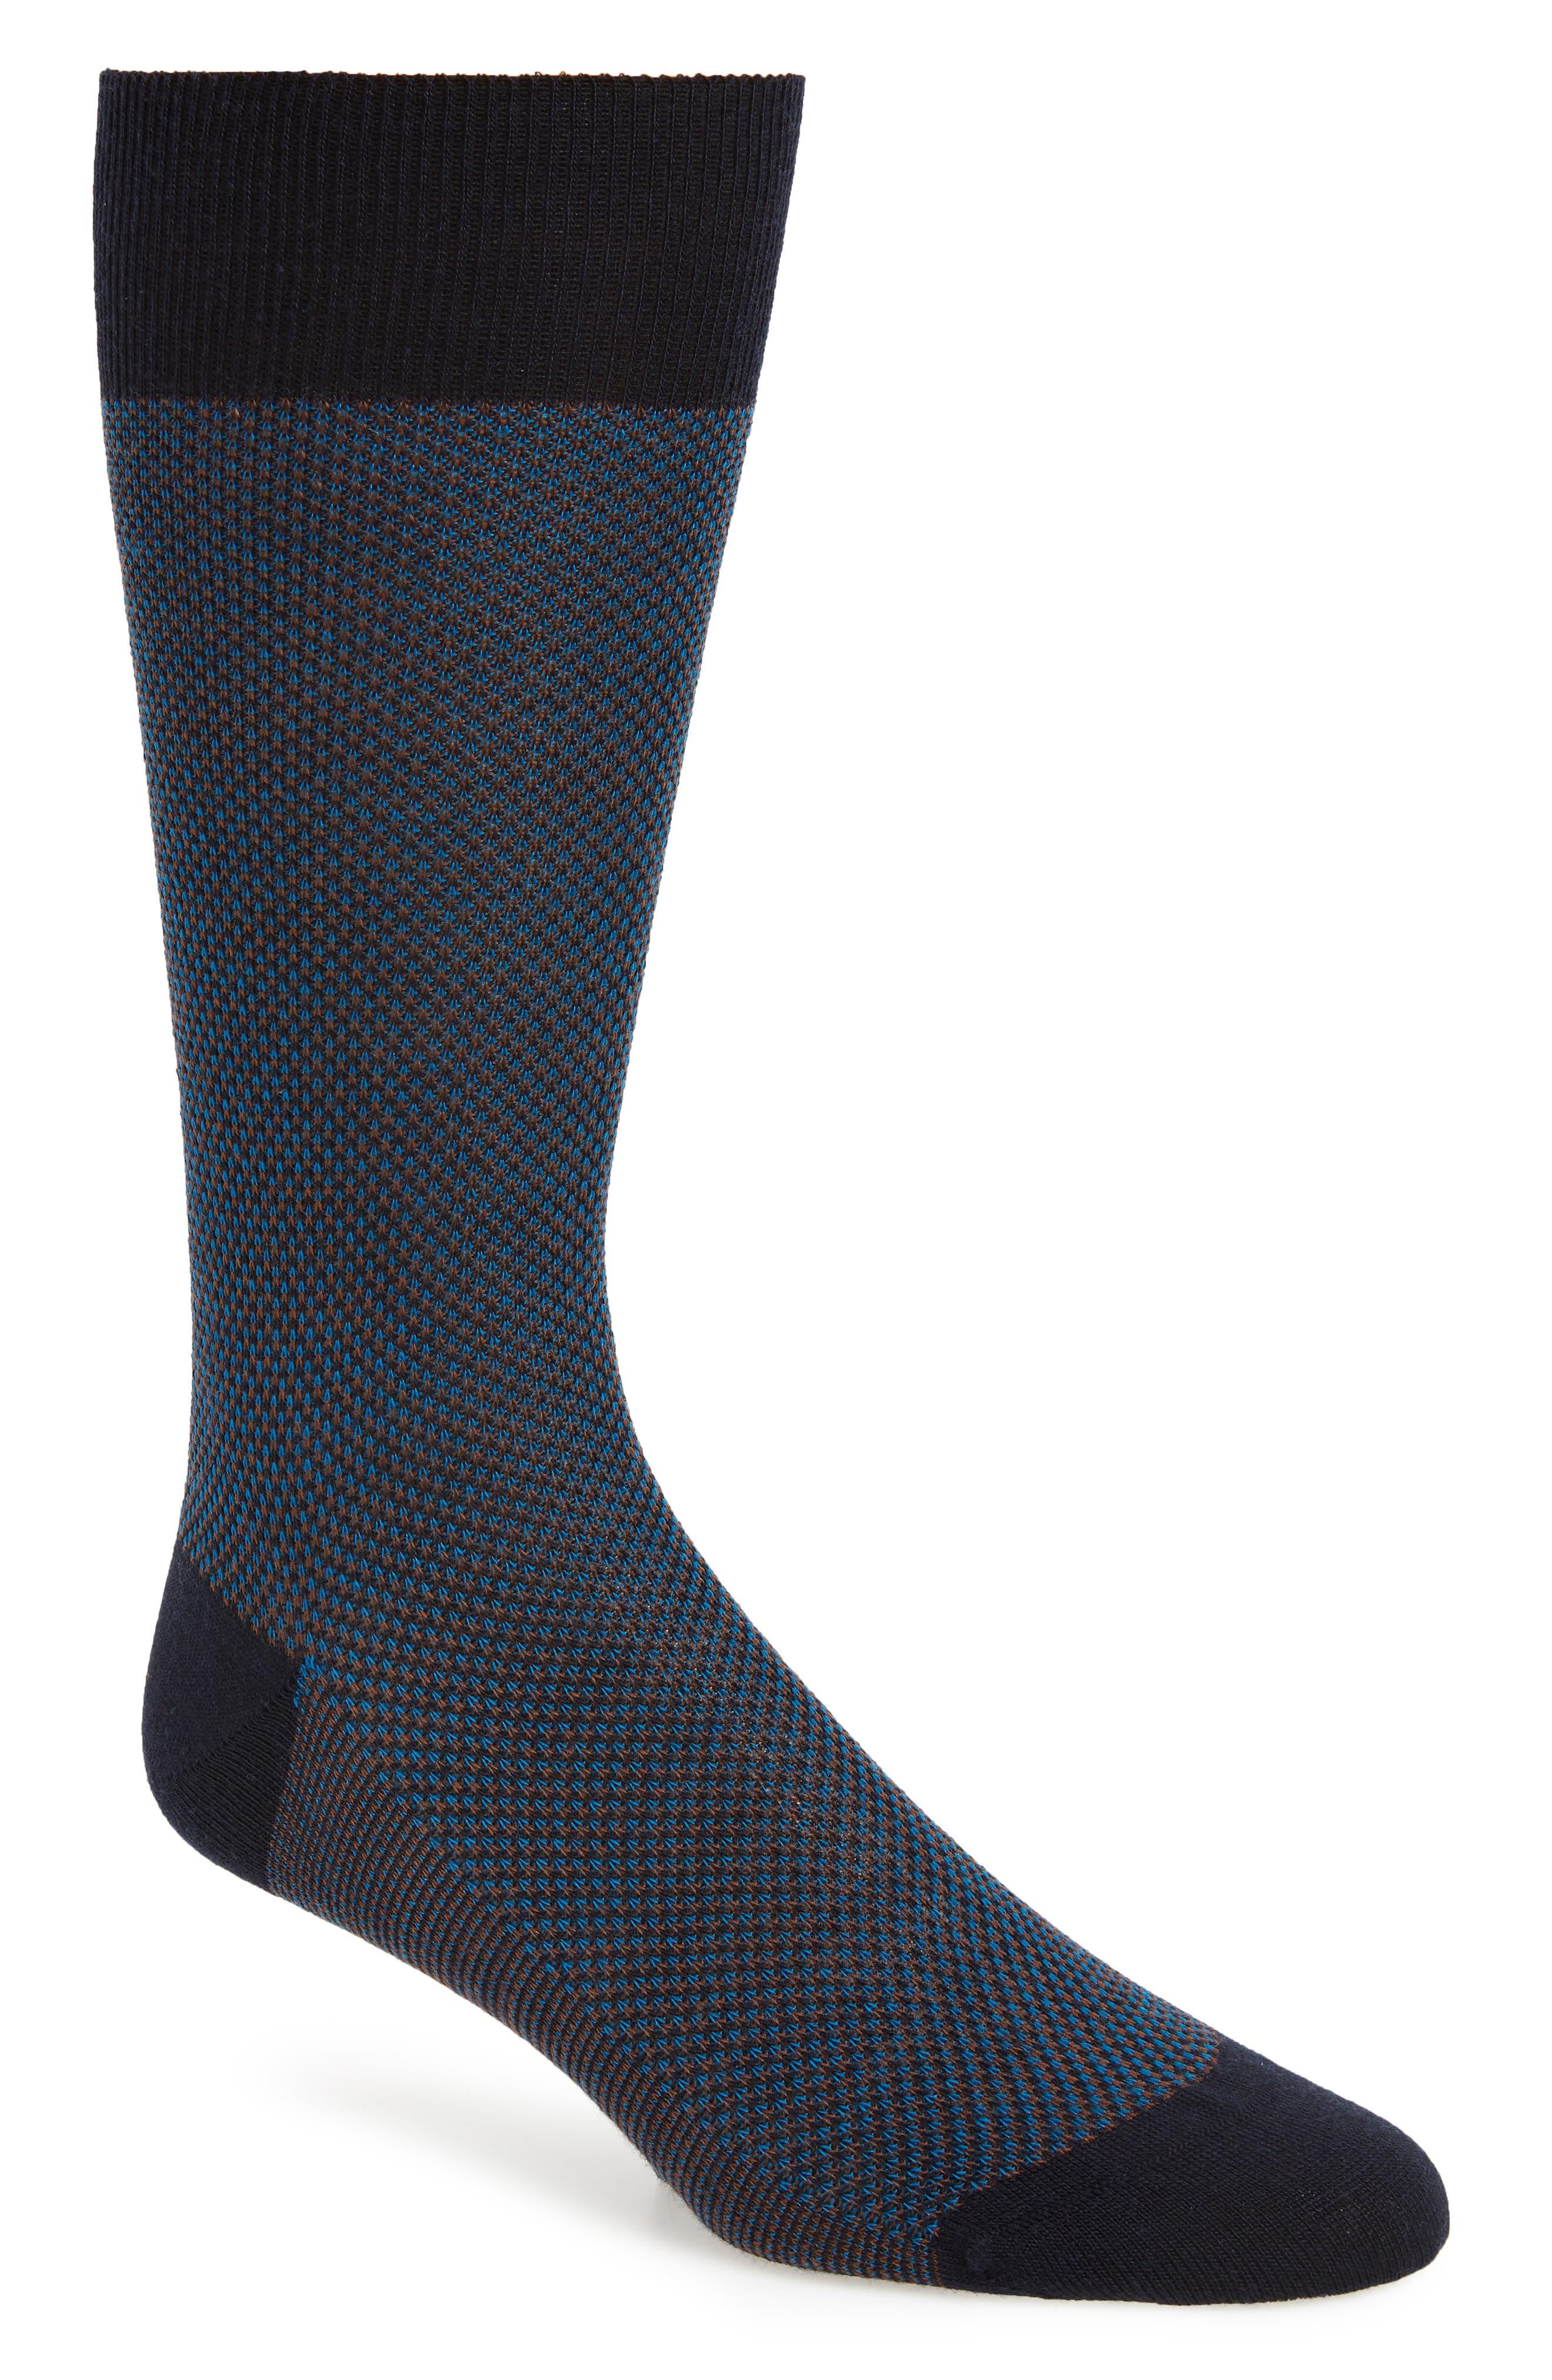 PANTHERELLA 'Vintage Collection - Blenheim' Merino Wool Blend Socks in New Navy